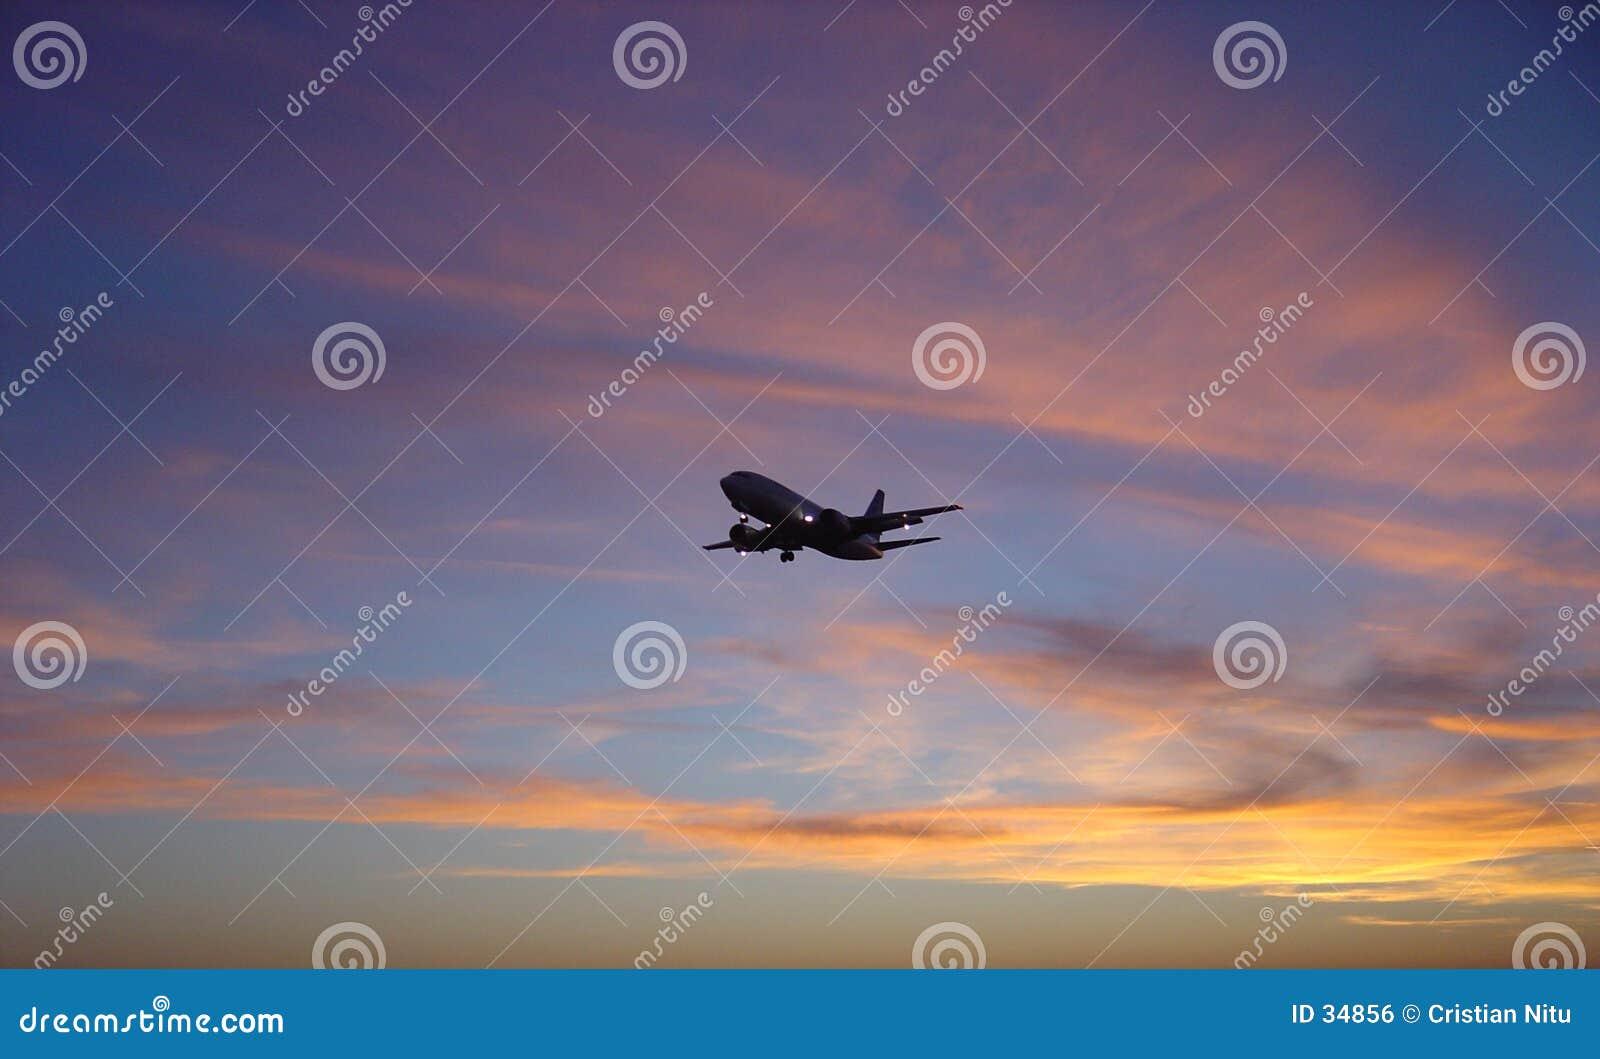 - samolot słońca